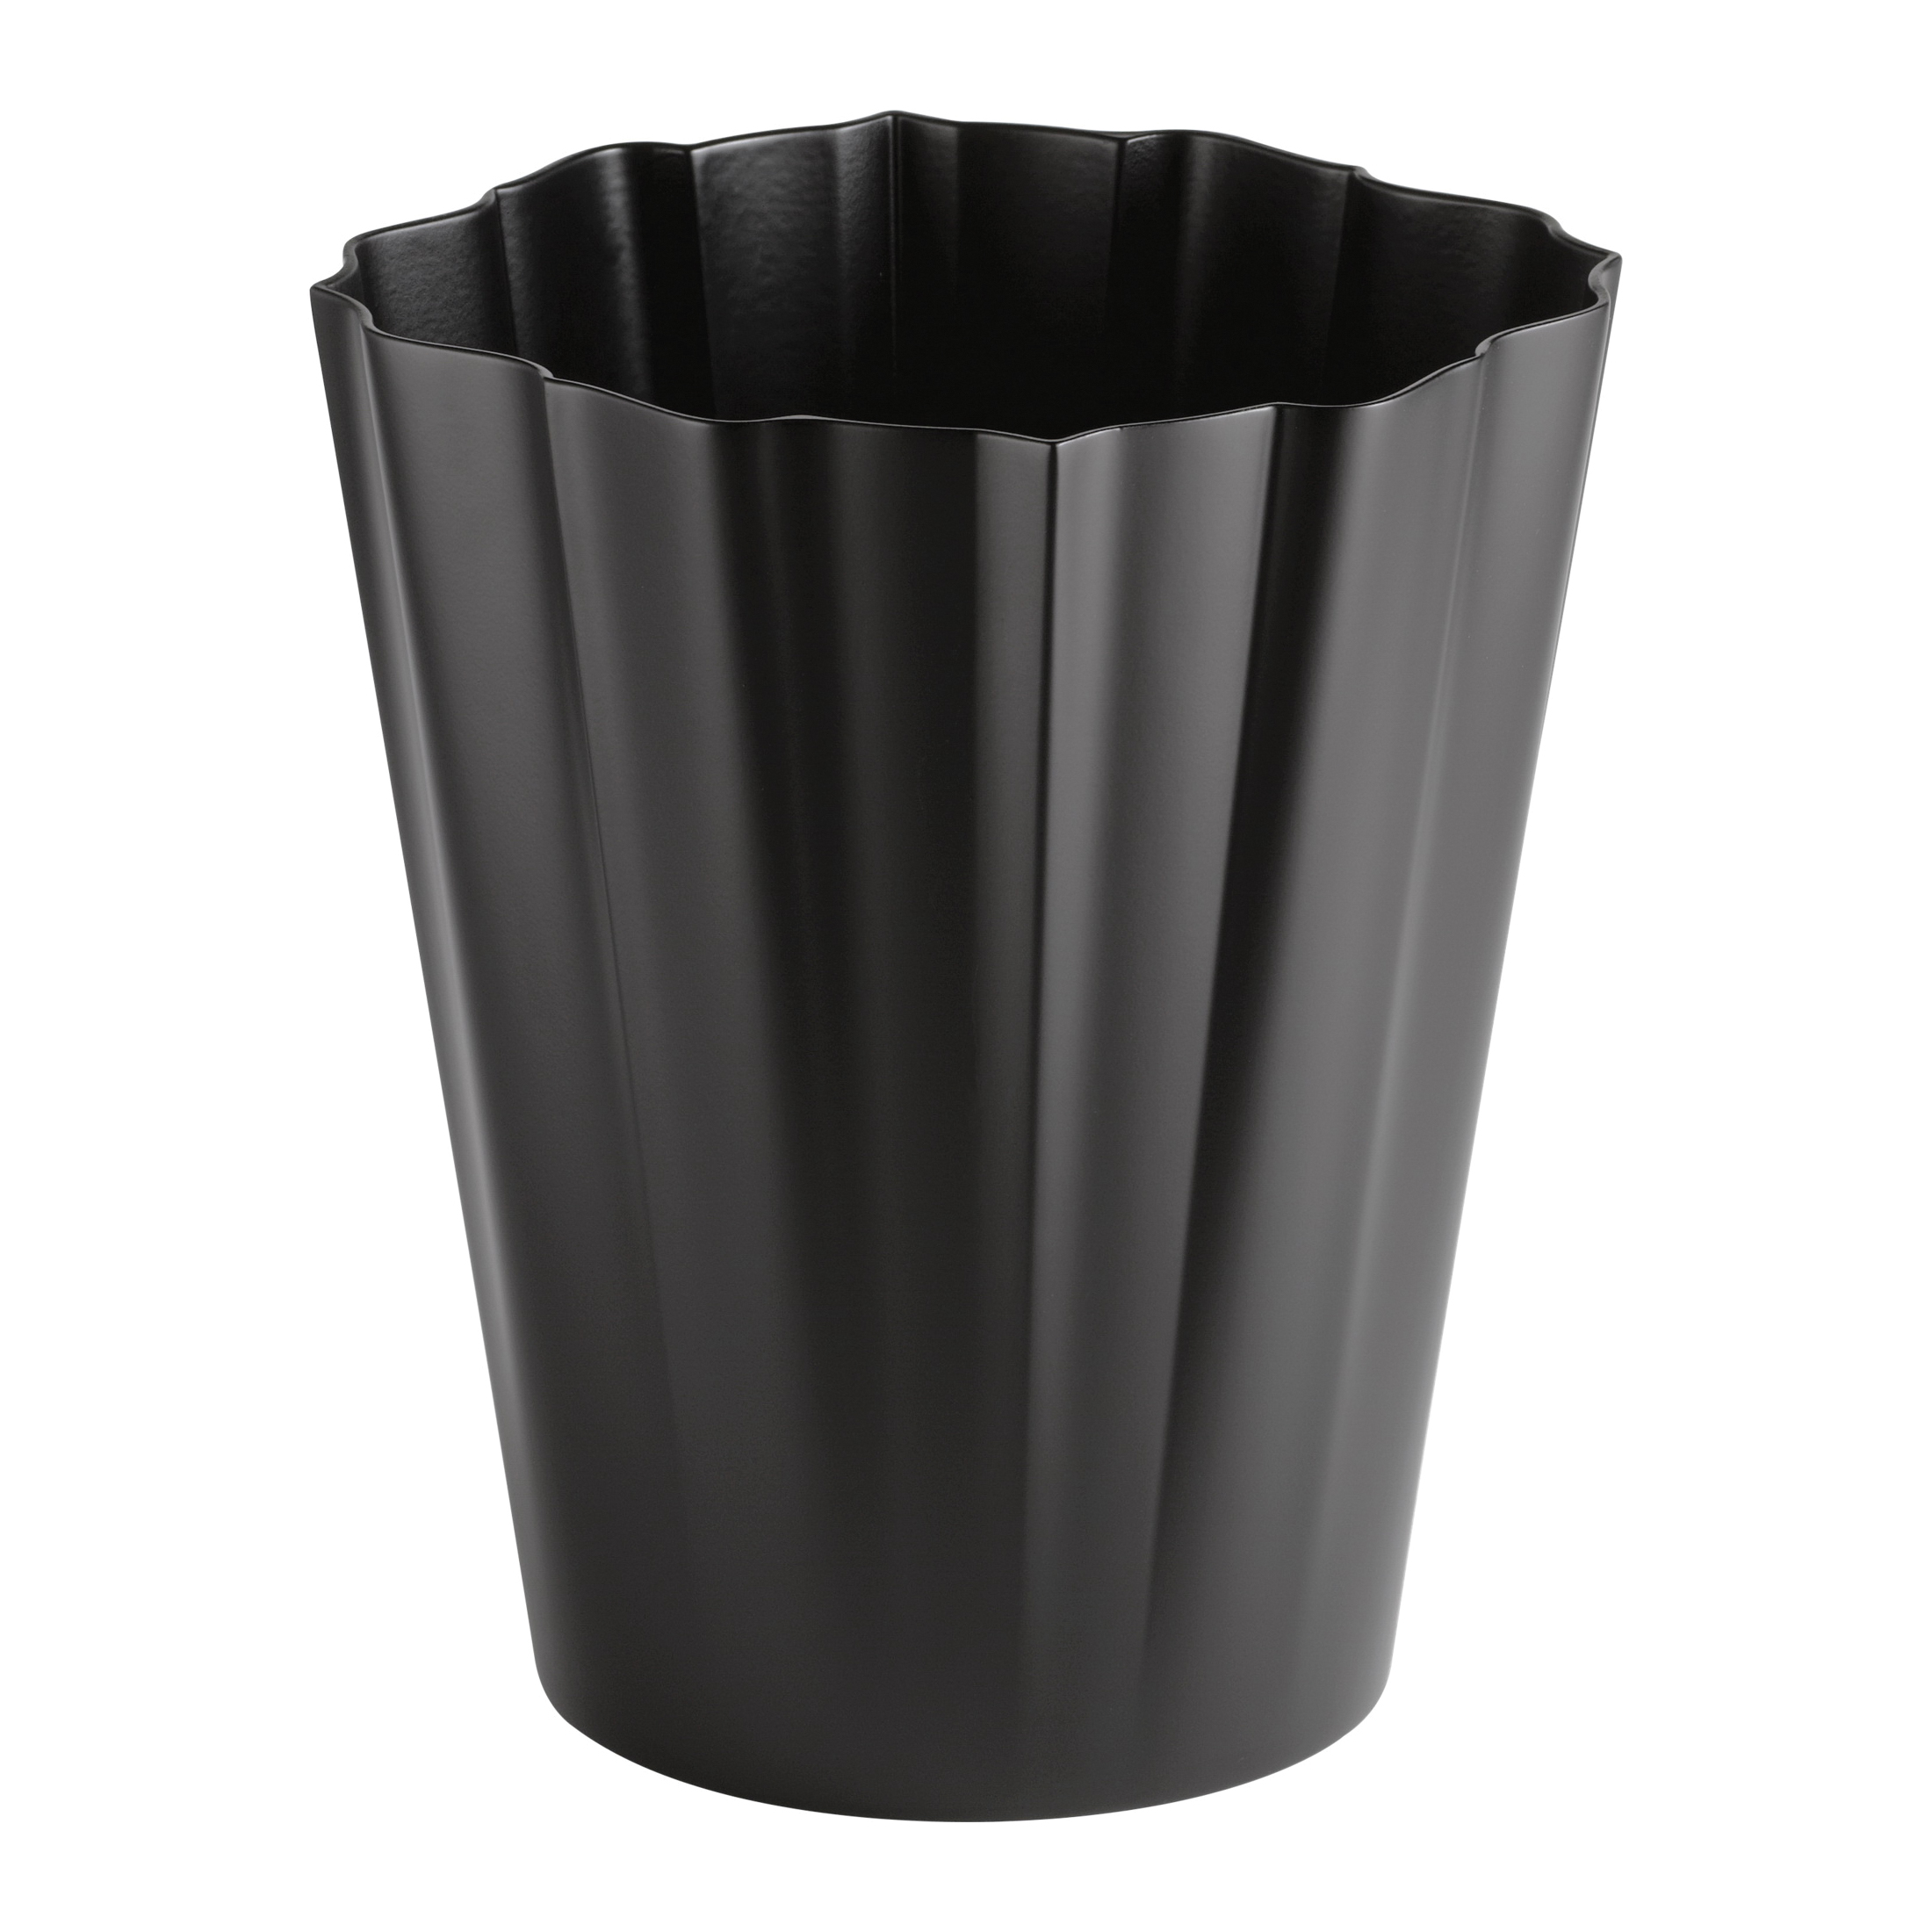 Brizo® 699060-BL Jason Wu Trash Can, 10 in Dia x 10 in L, Plastic